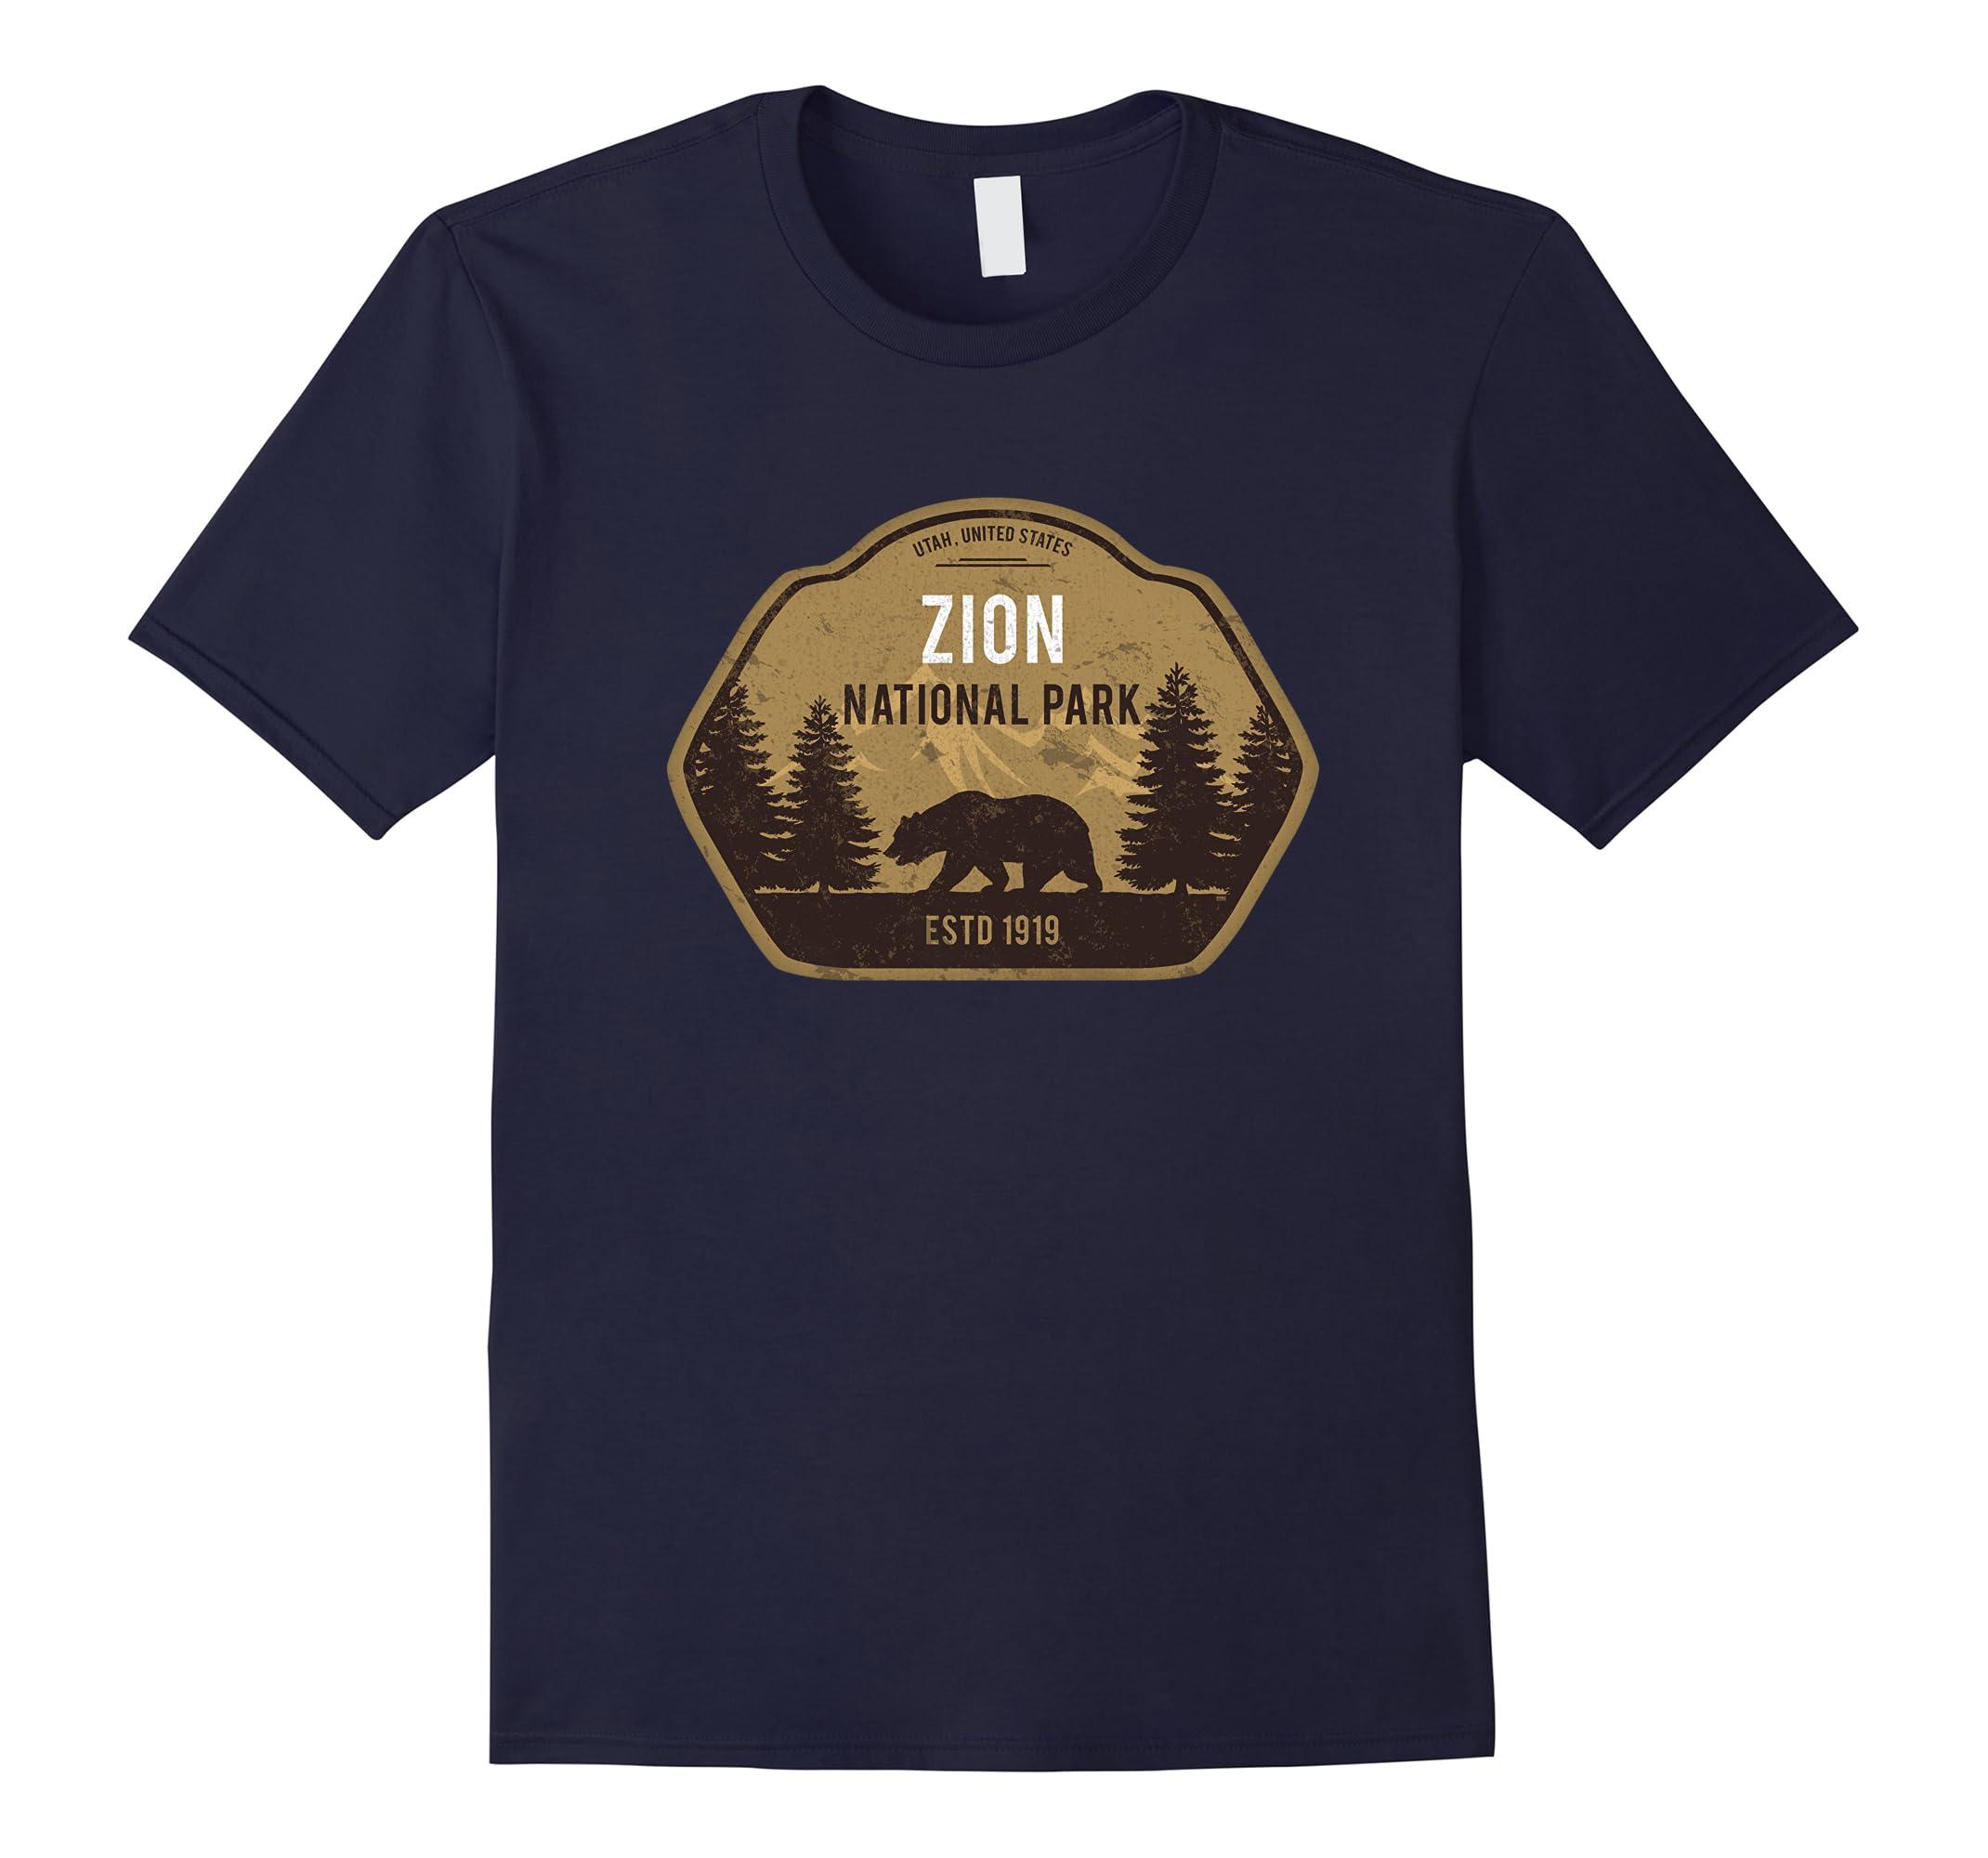 Zion National Park Utah T-Shirt Vintage Tee-RT